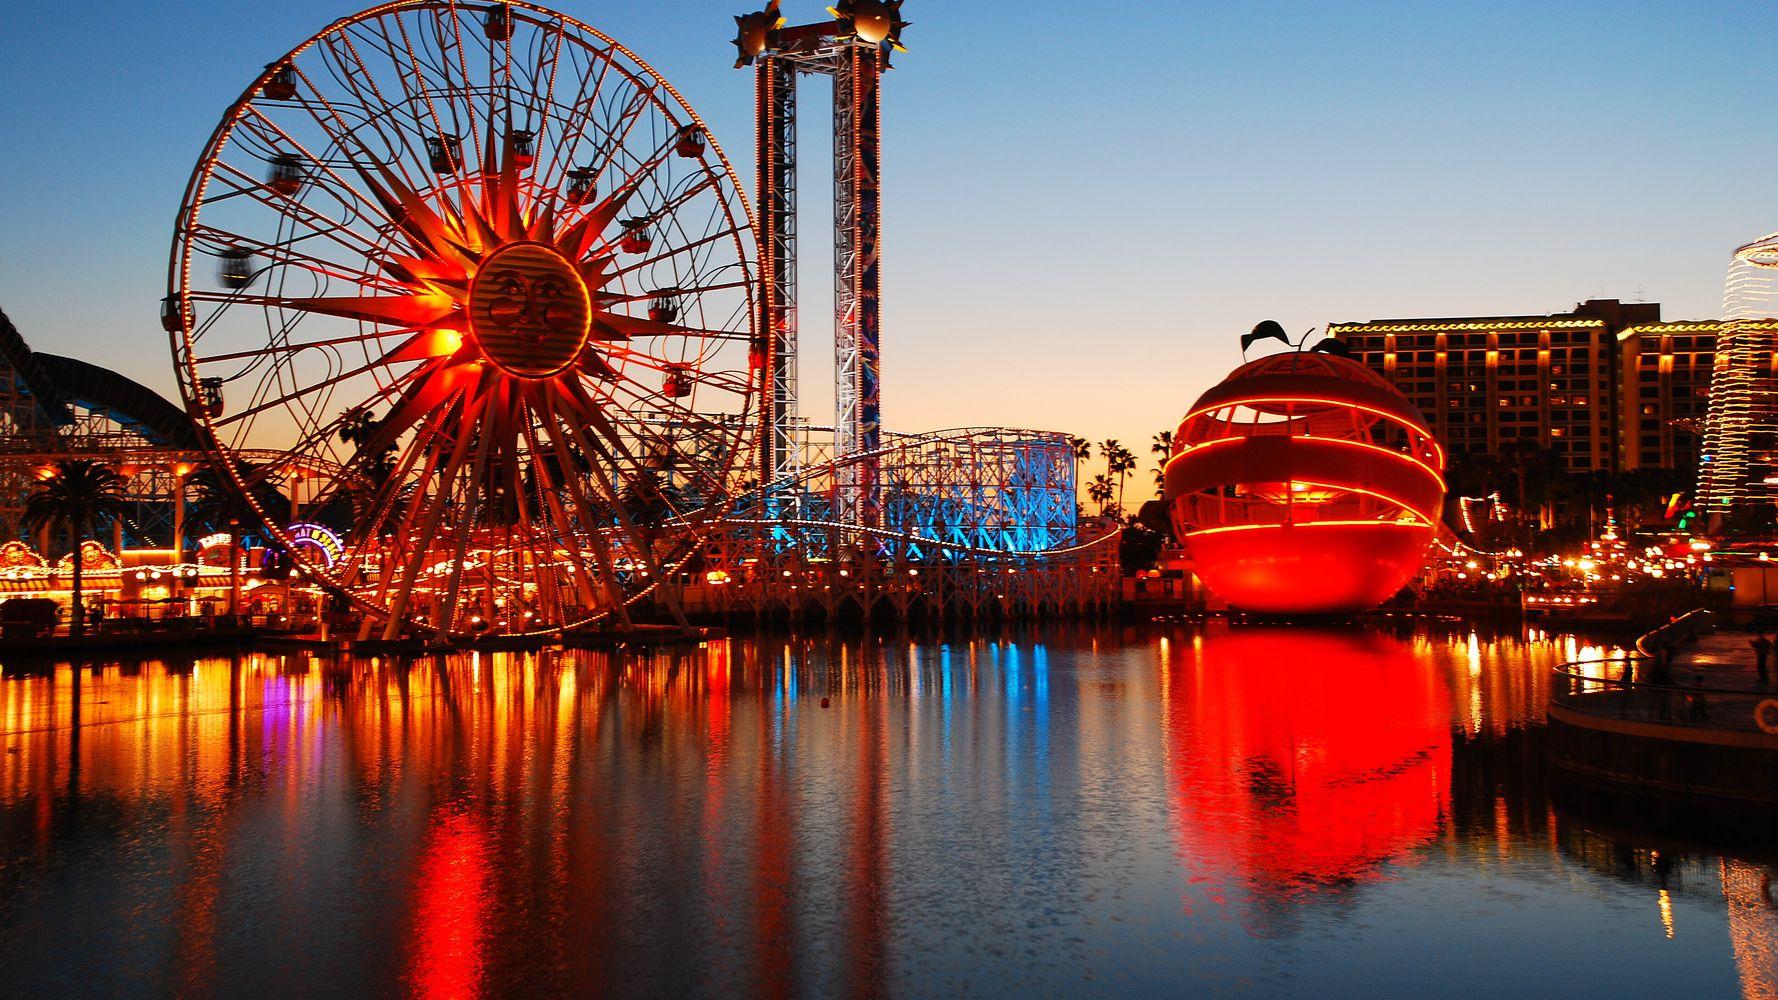 17 Creative Ways to Save Money at Disneyland | HuffPost Life